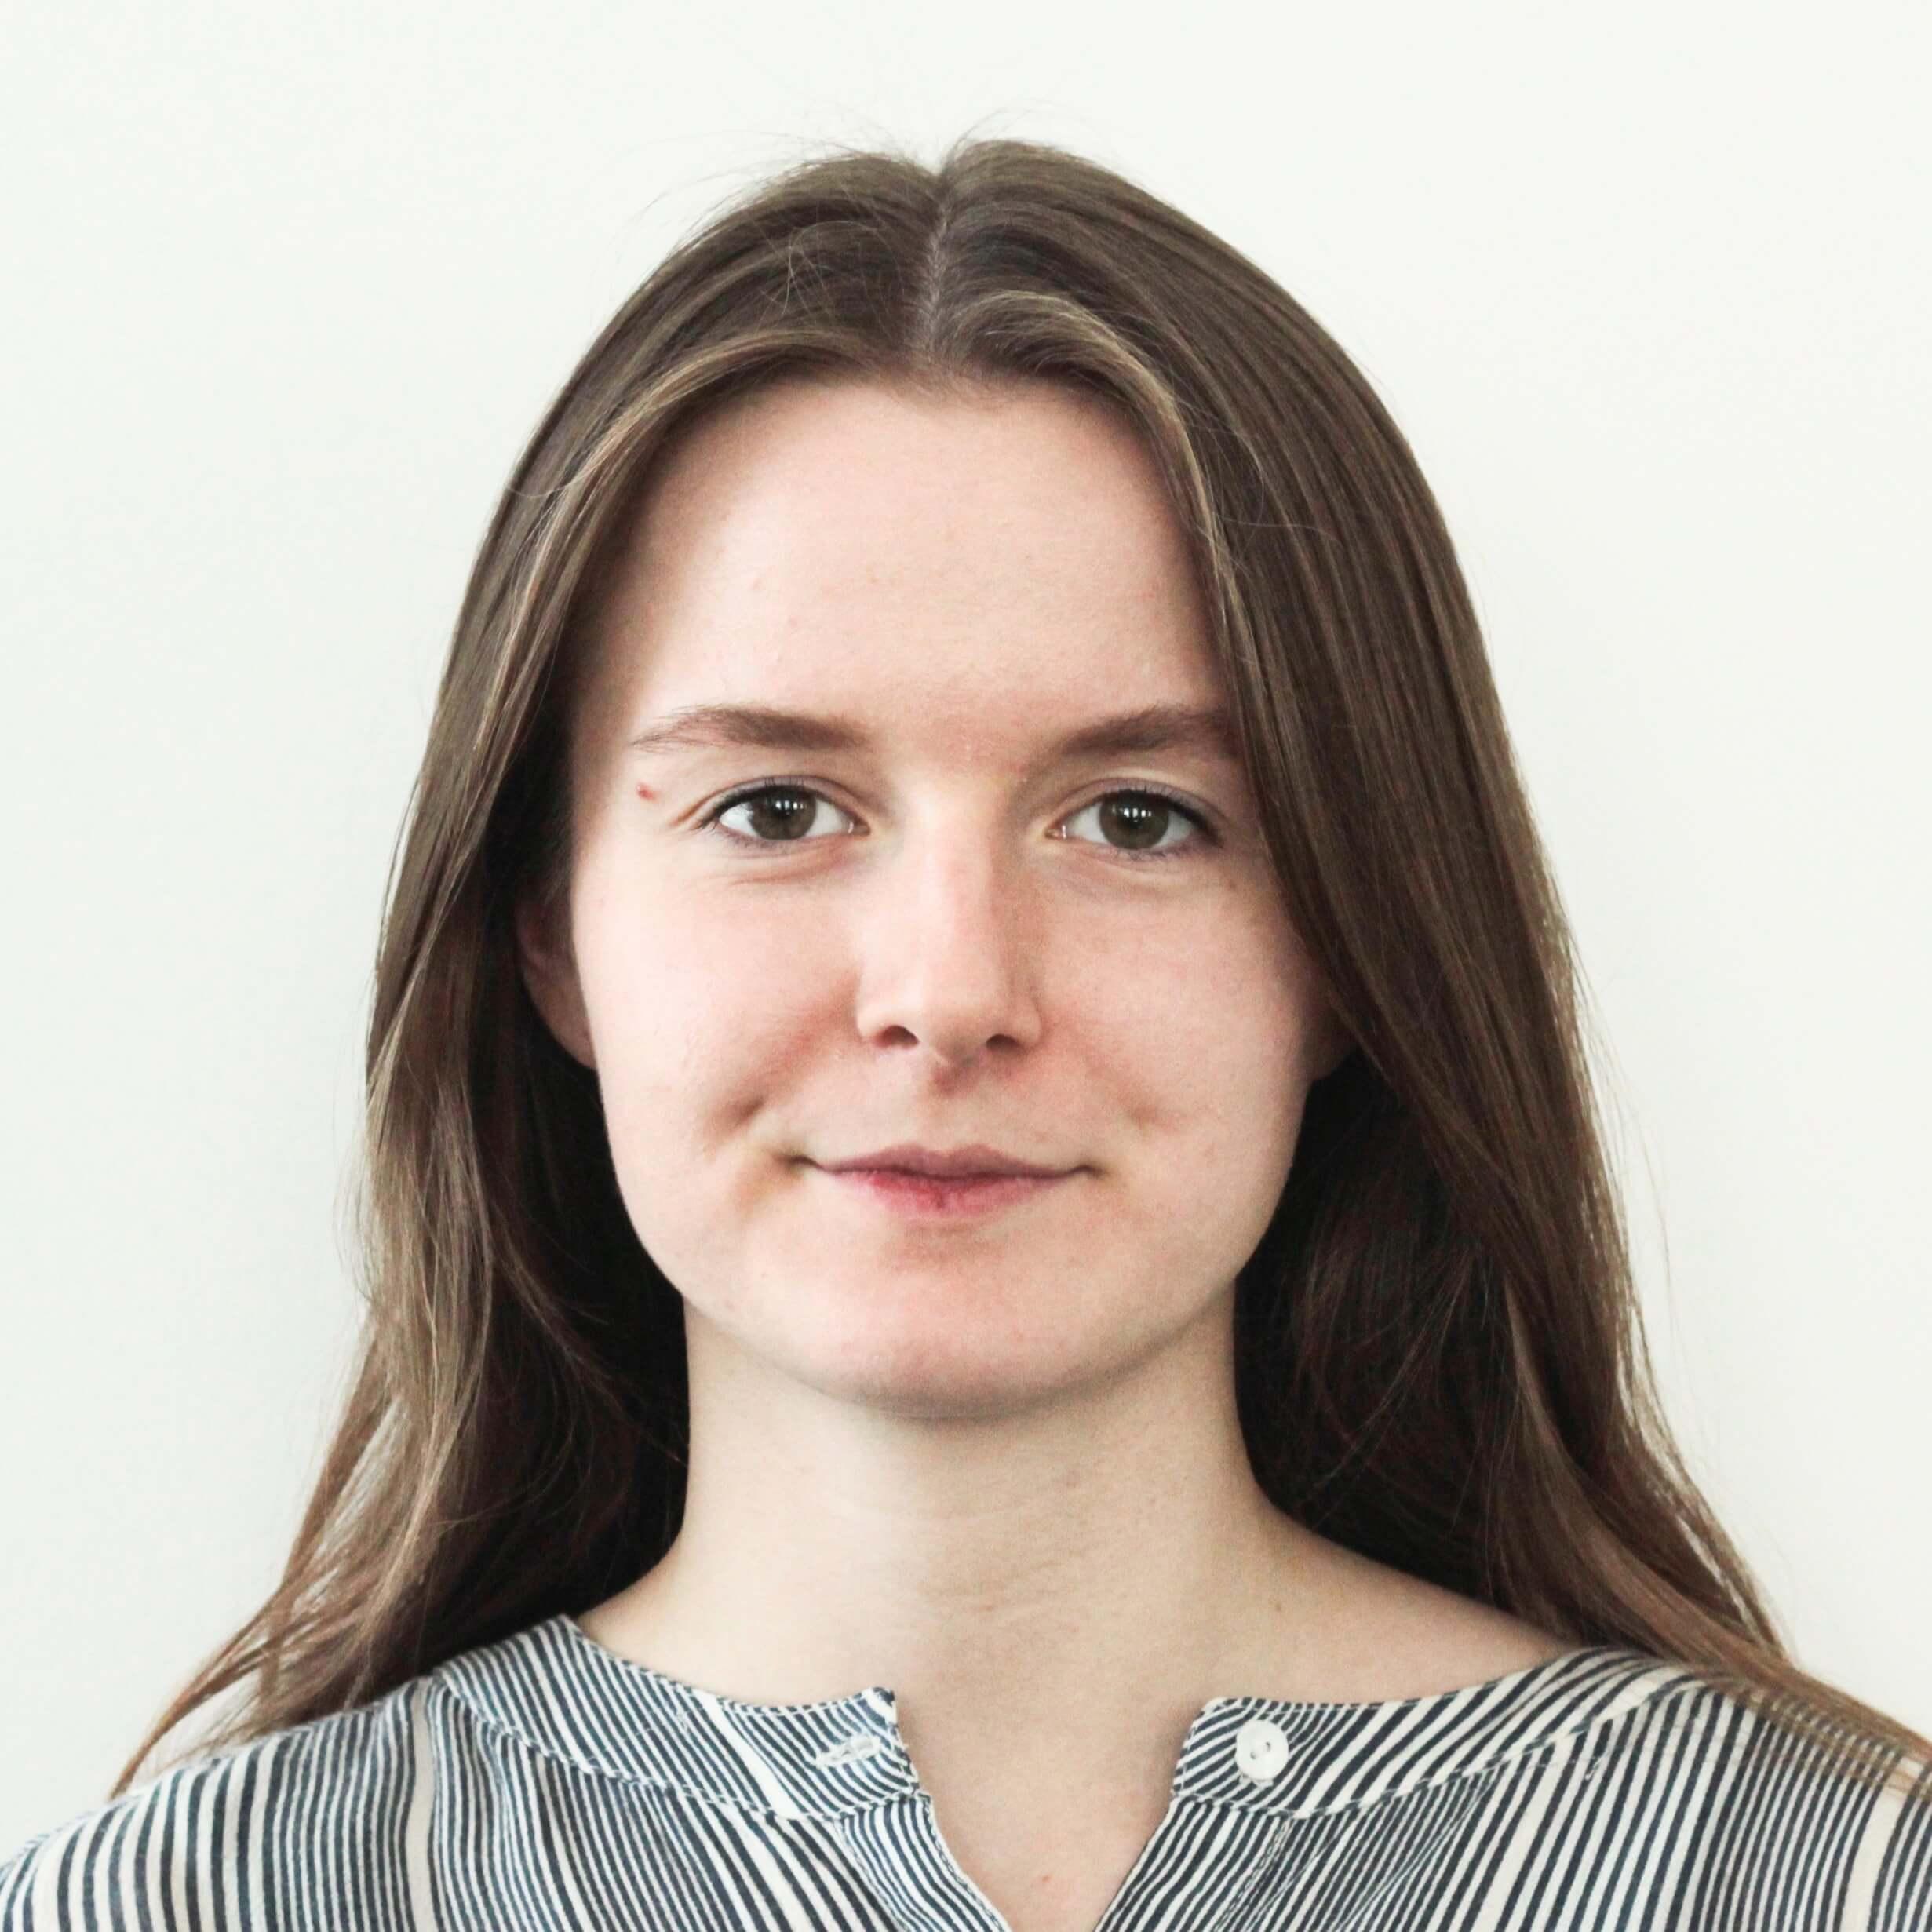 Milena Pechura